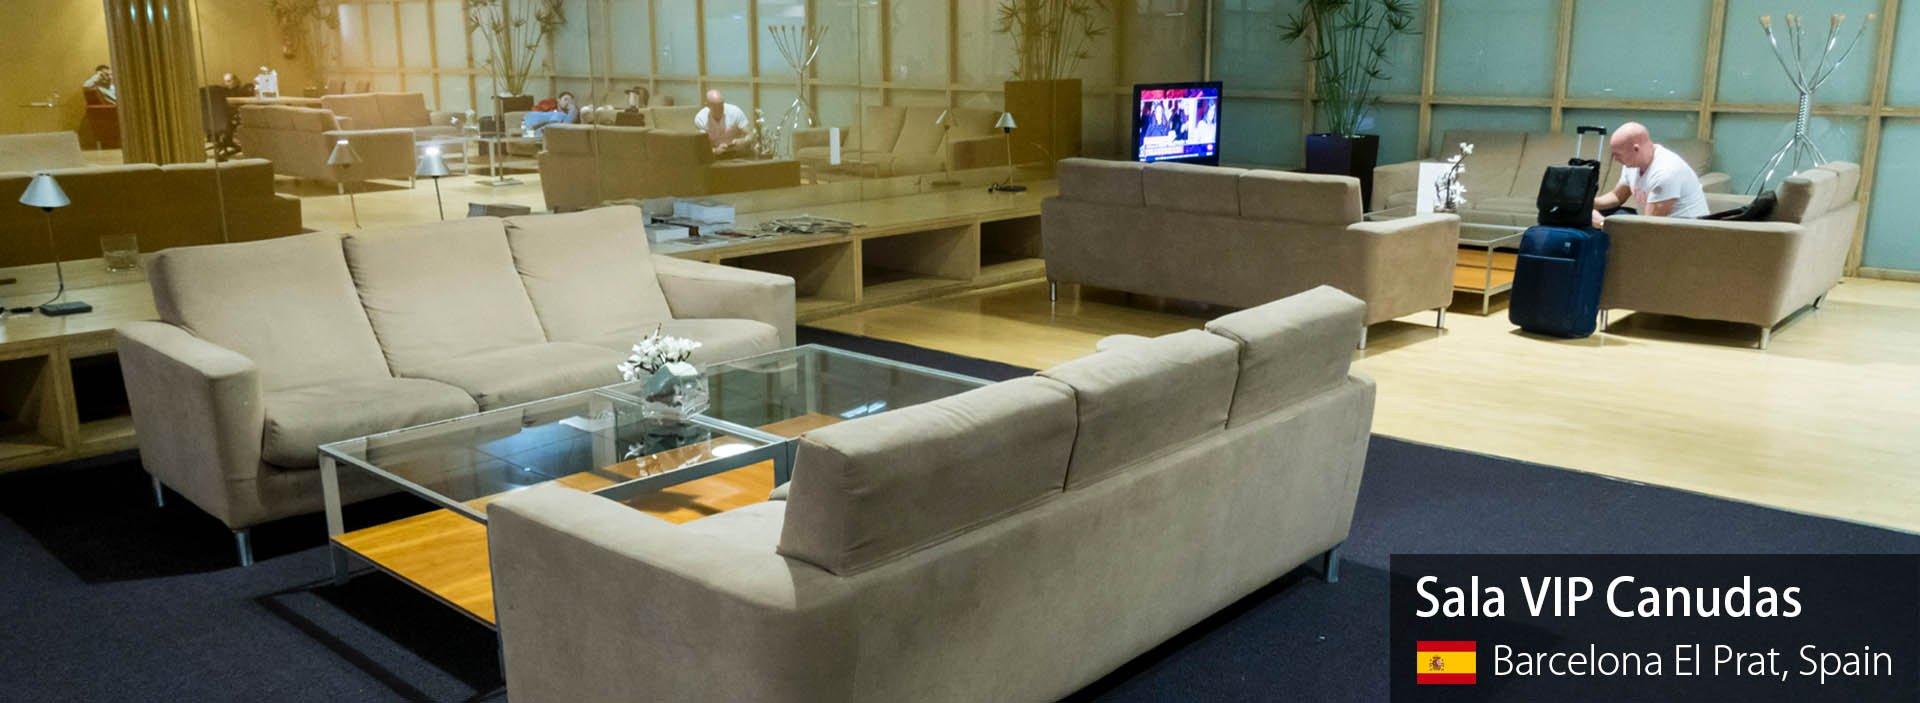 Lounge Review: Sala VIP Canudas at Barcelona El Prat (Priority Pass Lounge)